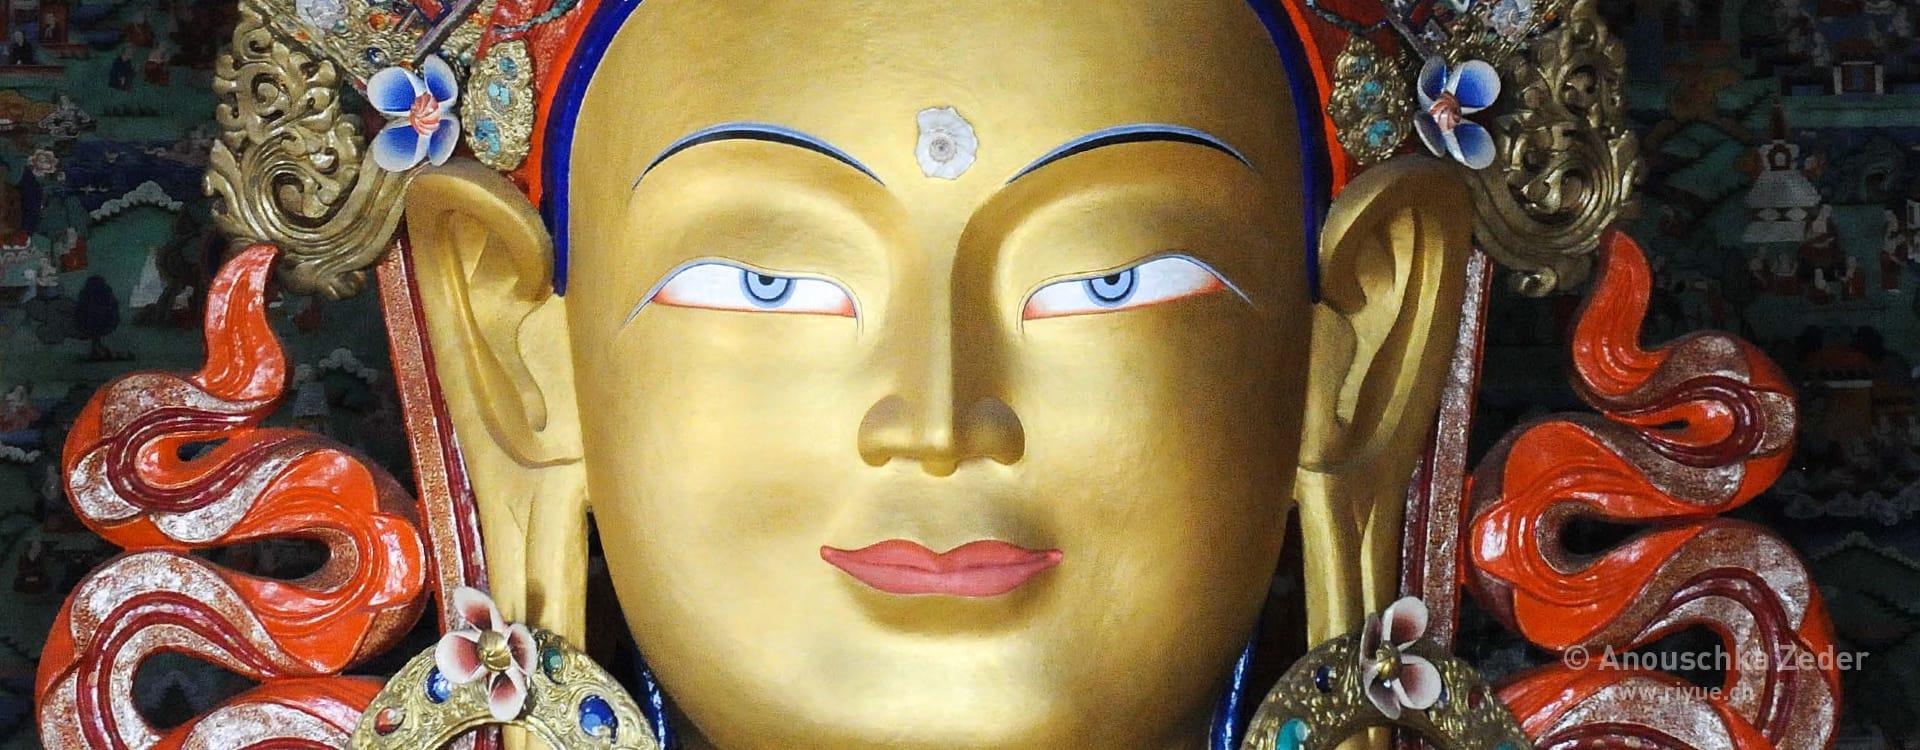 riyue – Links – Buddha Ladakh